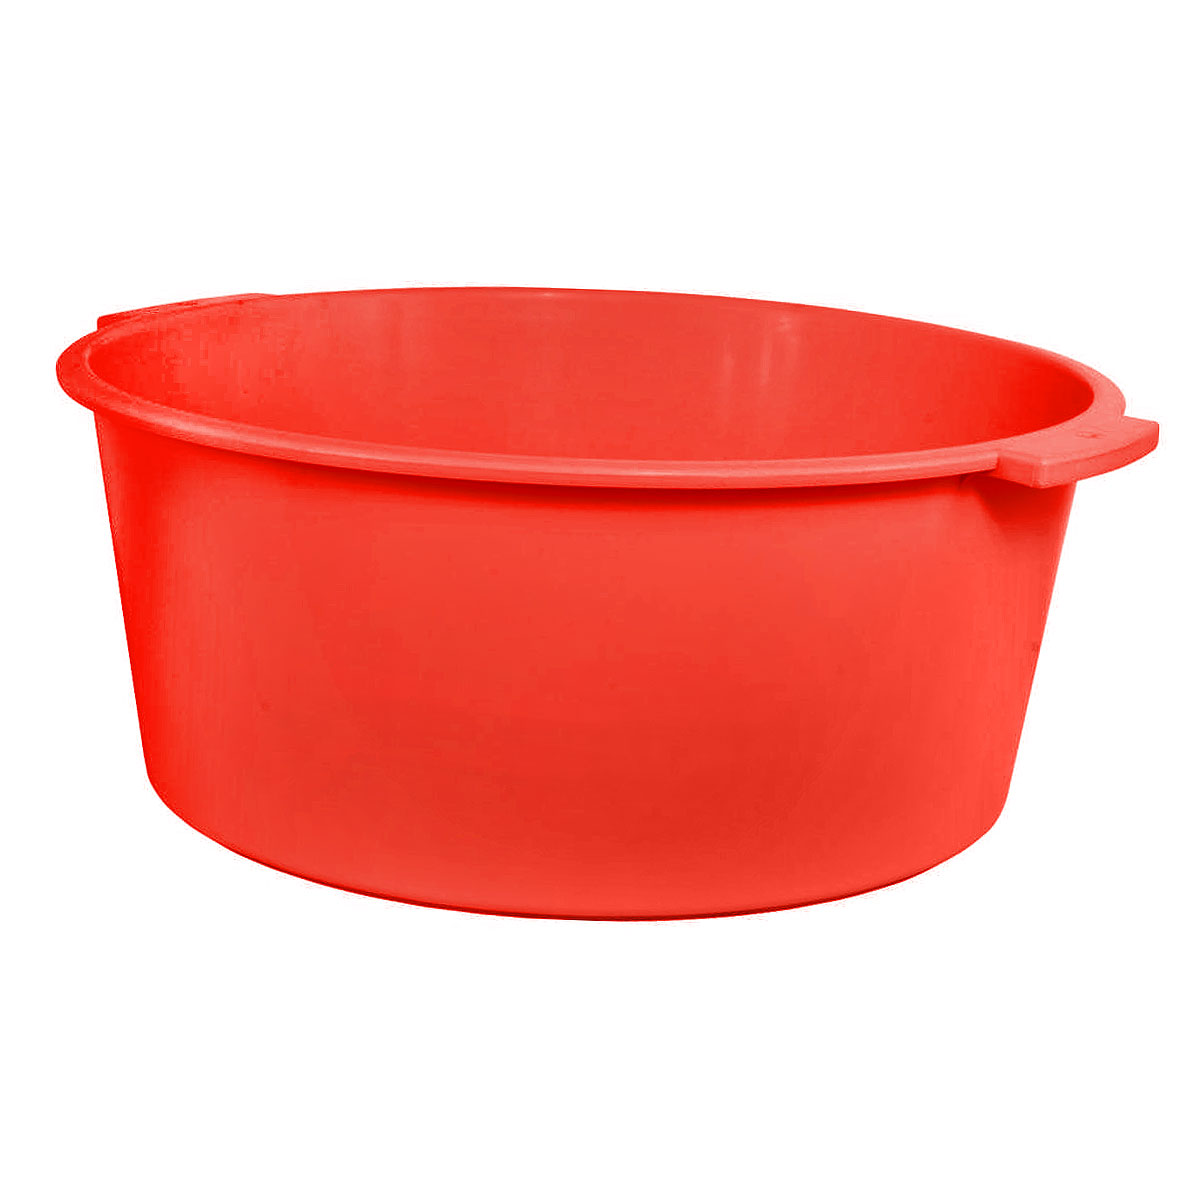 Таз Крепыш, цвет: красный, 15 л таз азалия объем 10 л цвет зеленый 952965